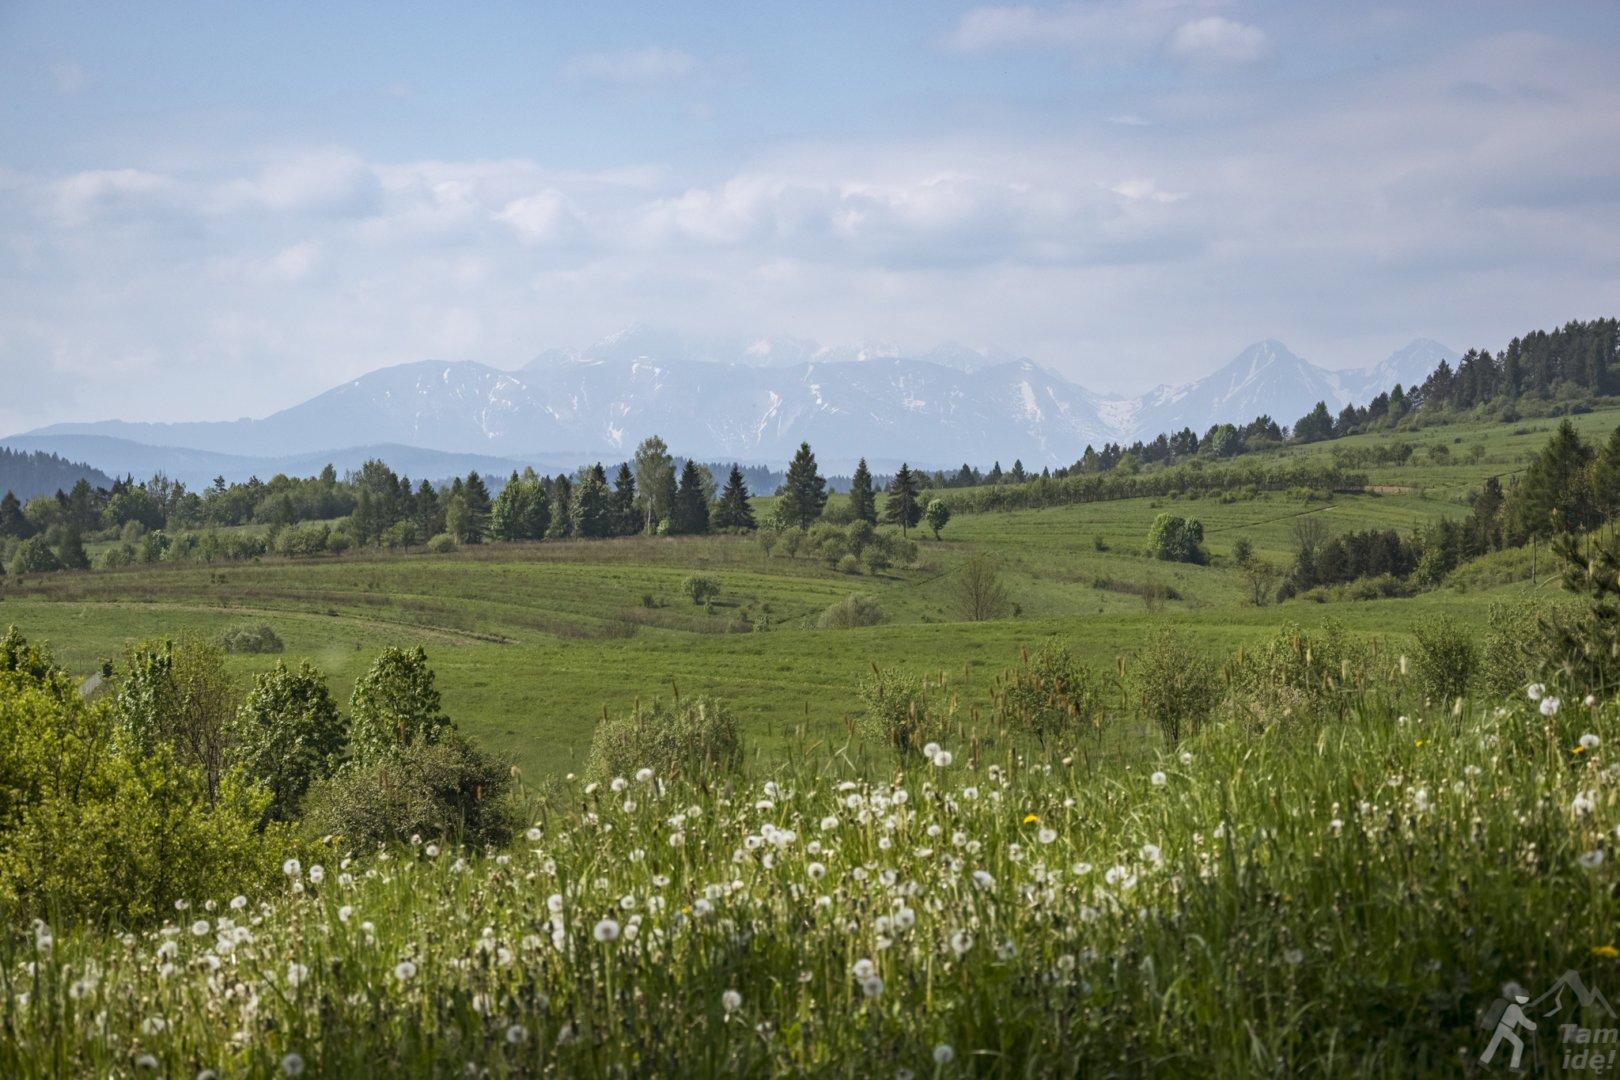 Widok na Tatry spod schroniska PTTK Trzy Korony